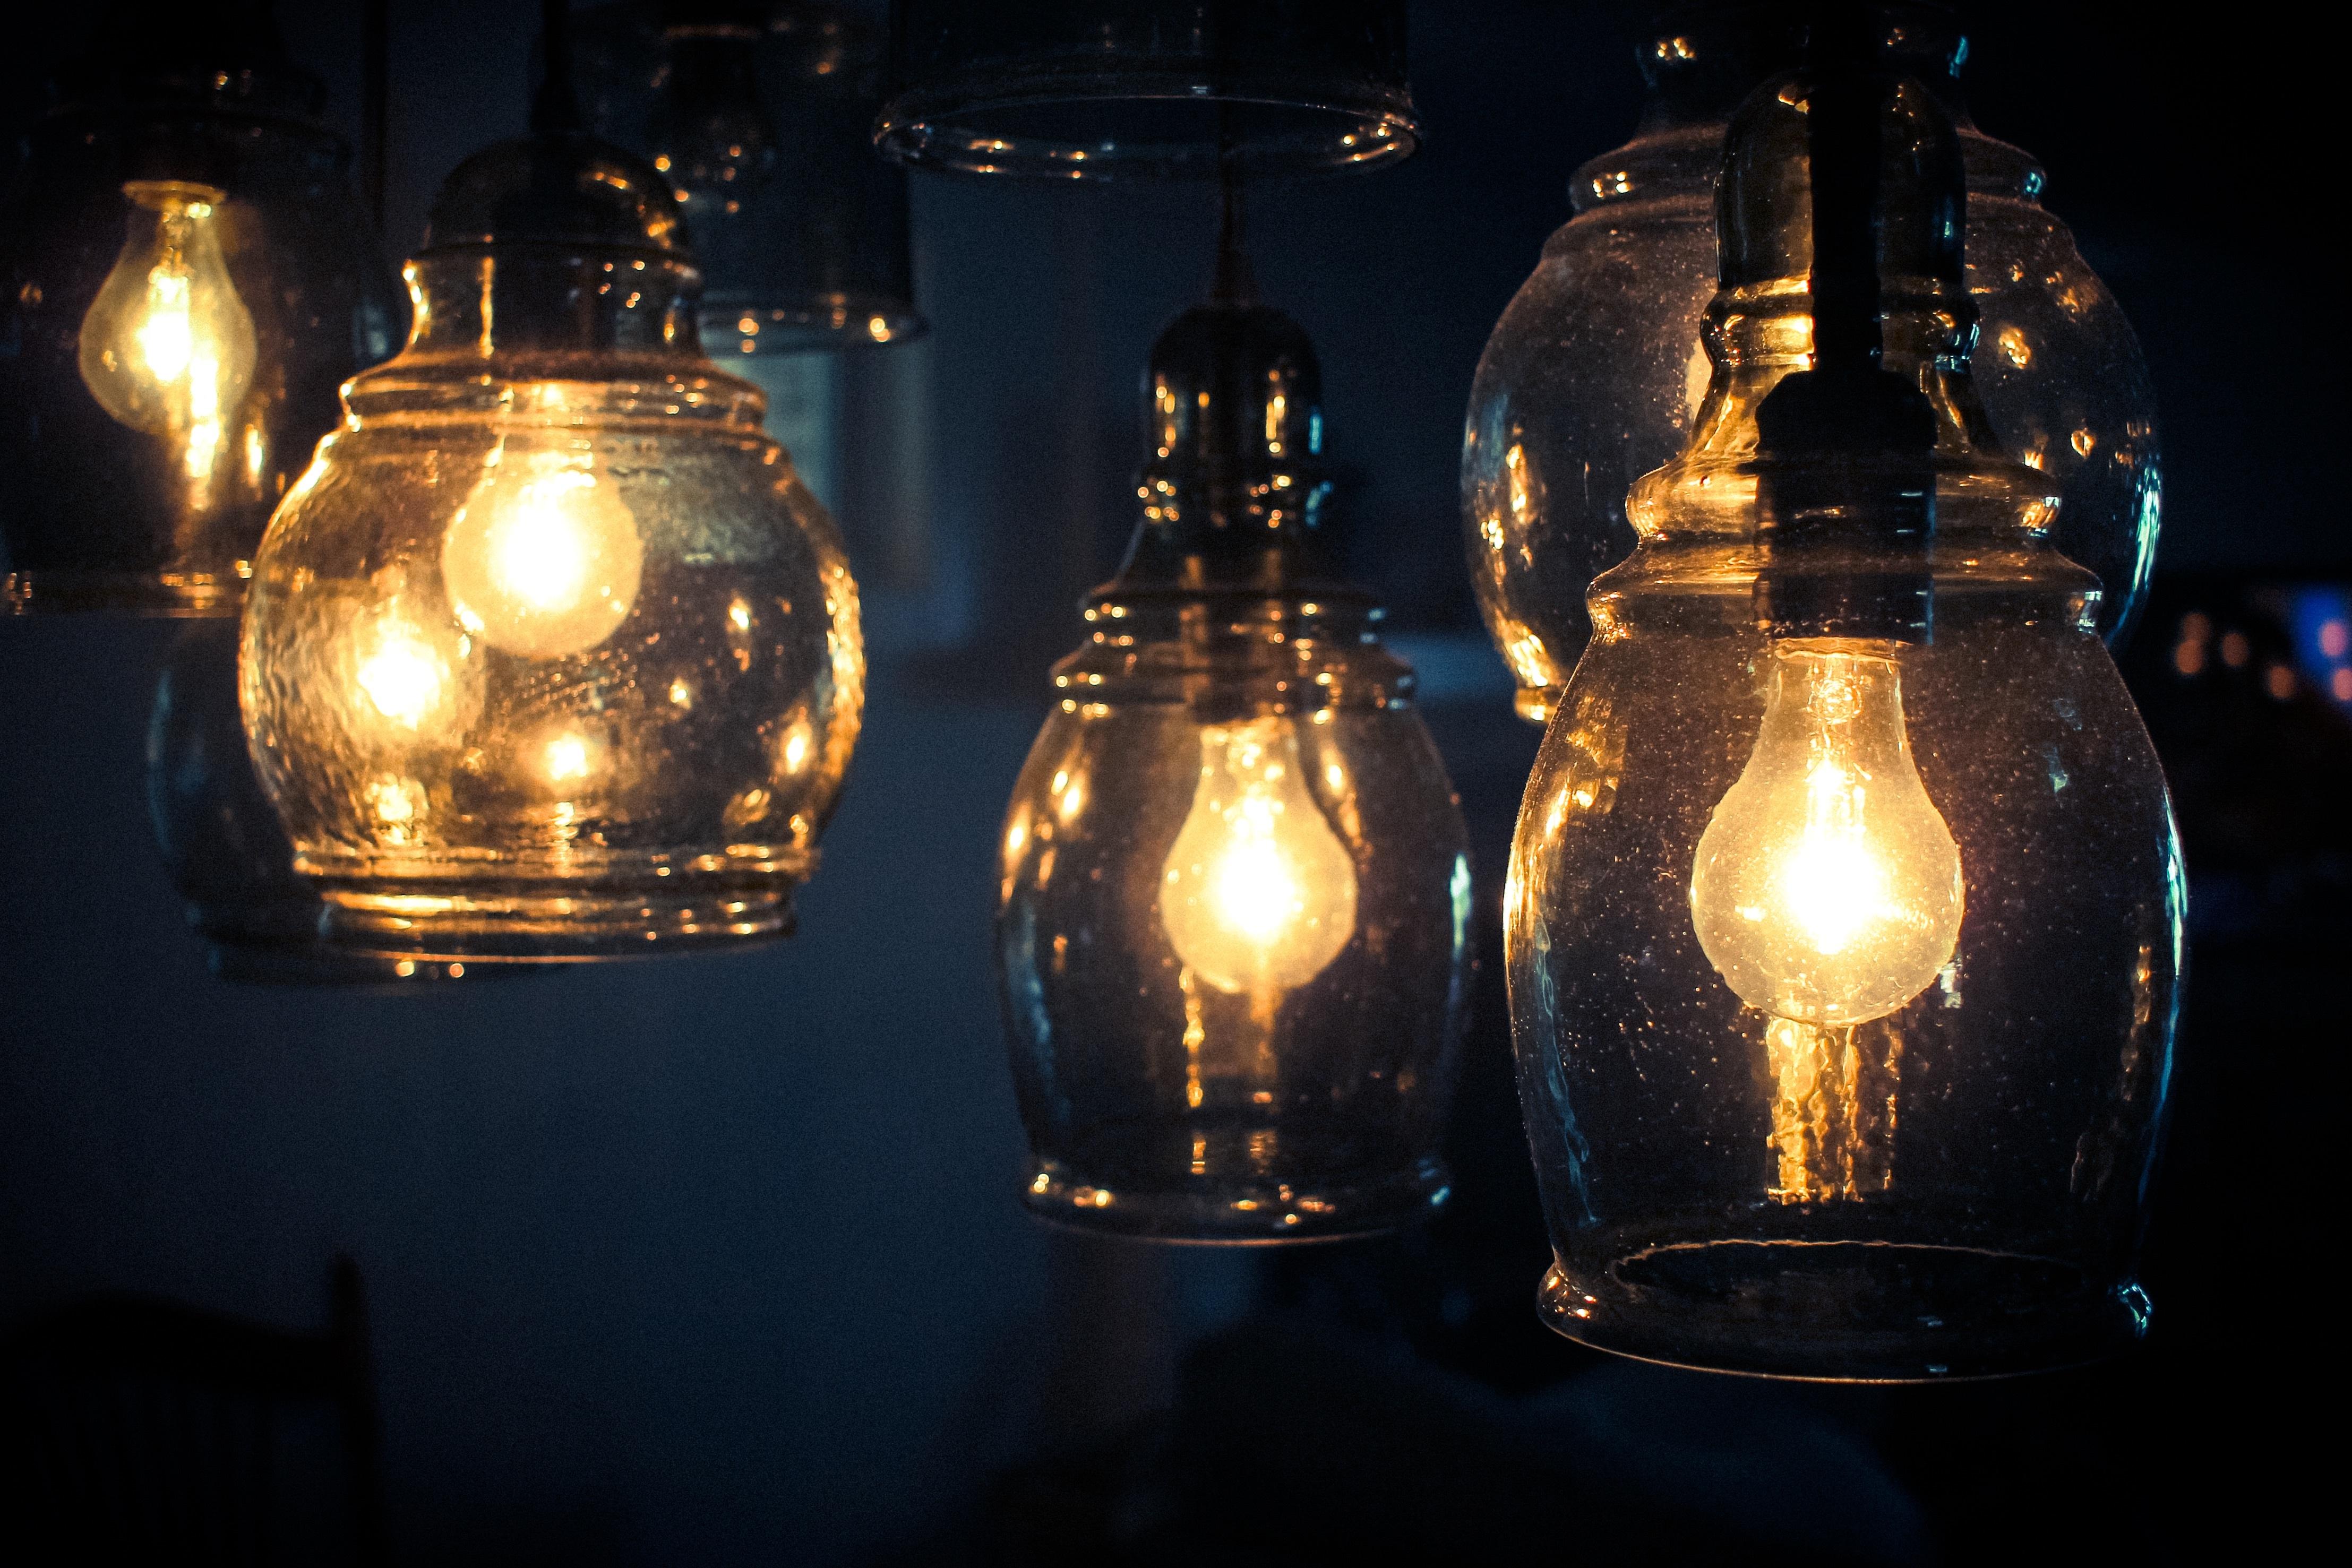 картинки с лампочками марселя было